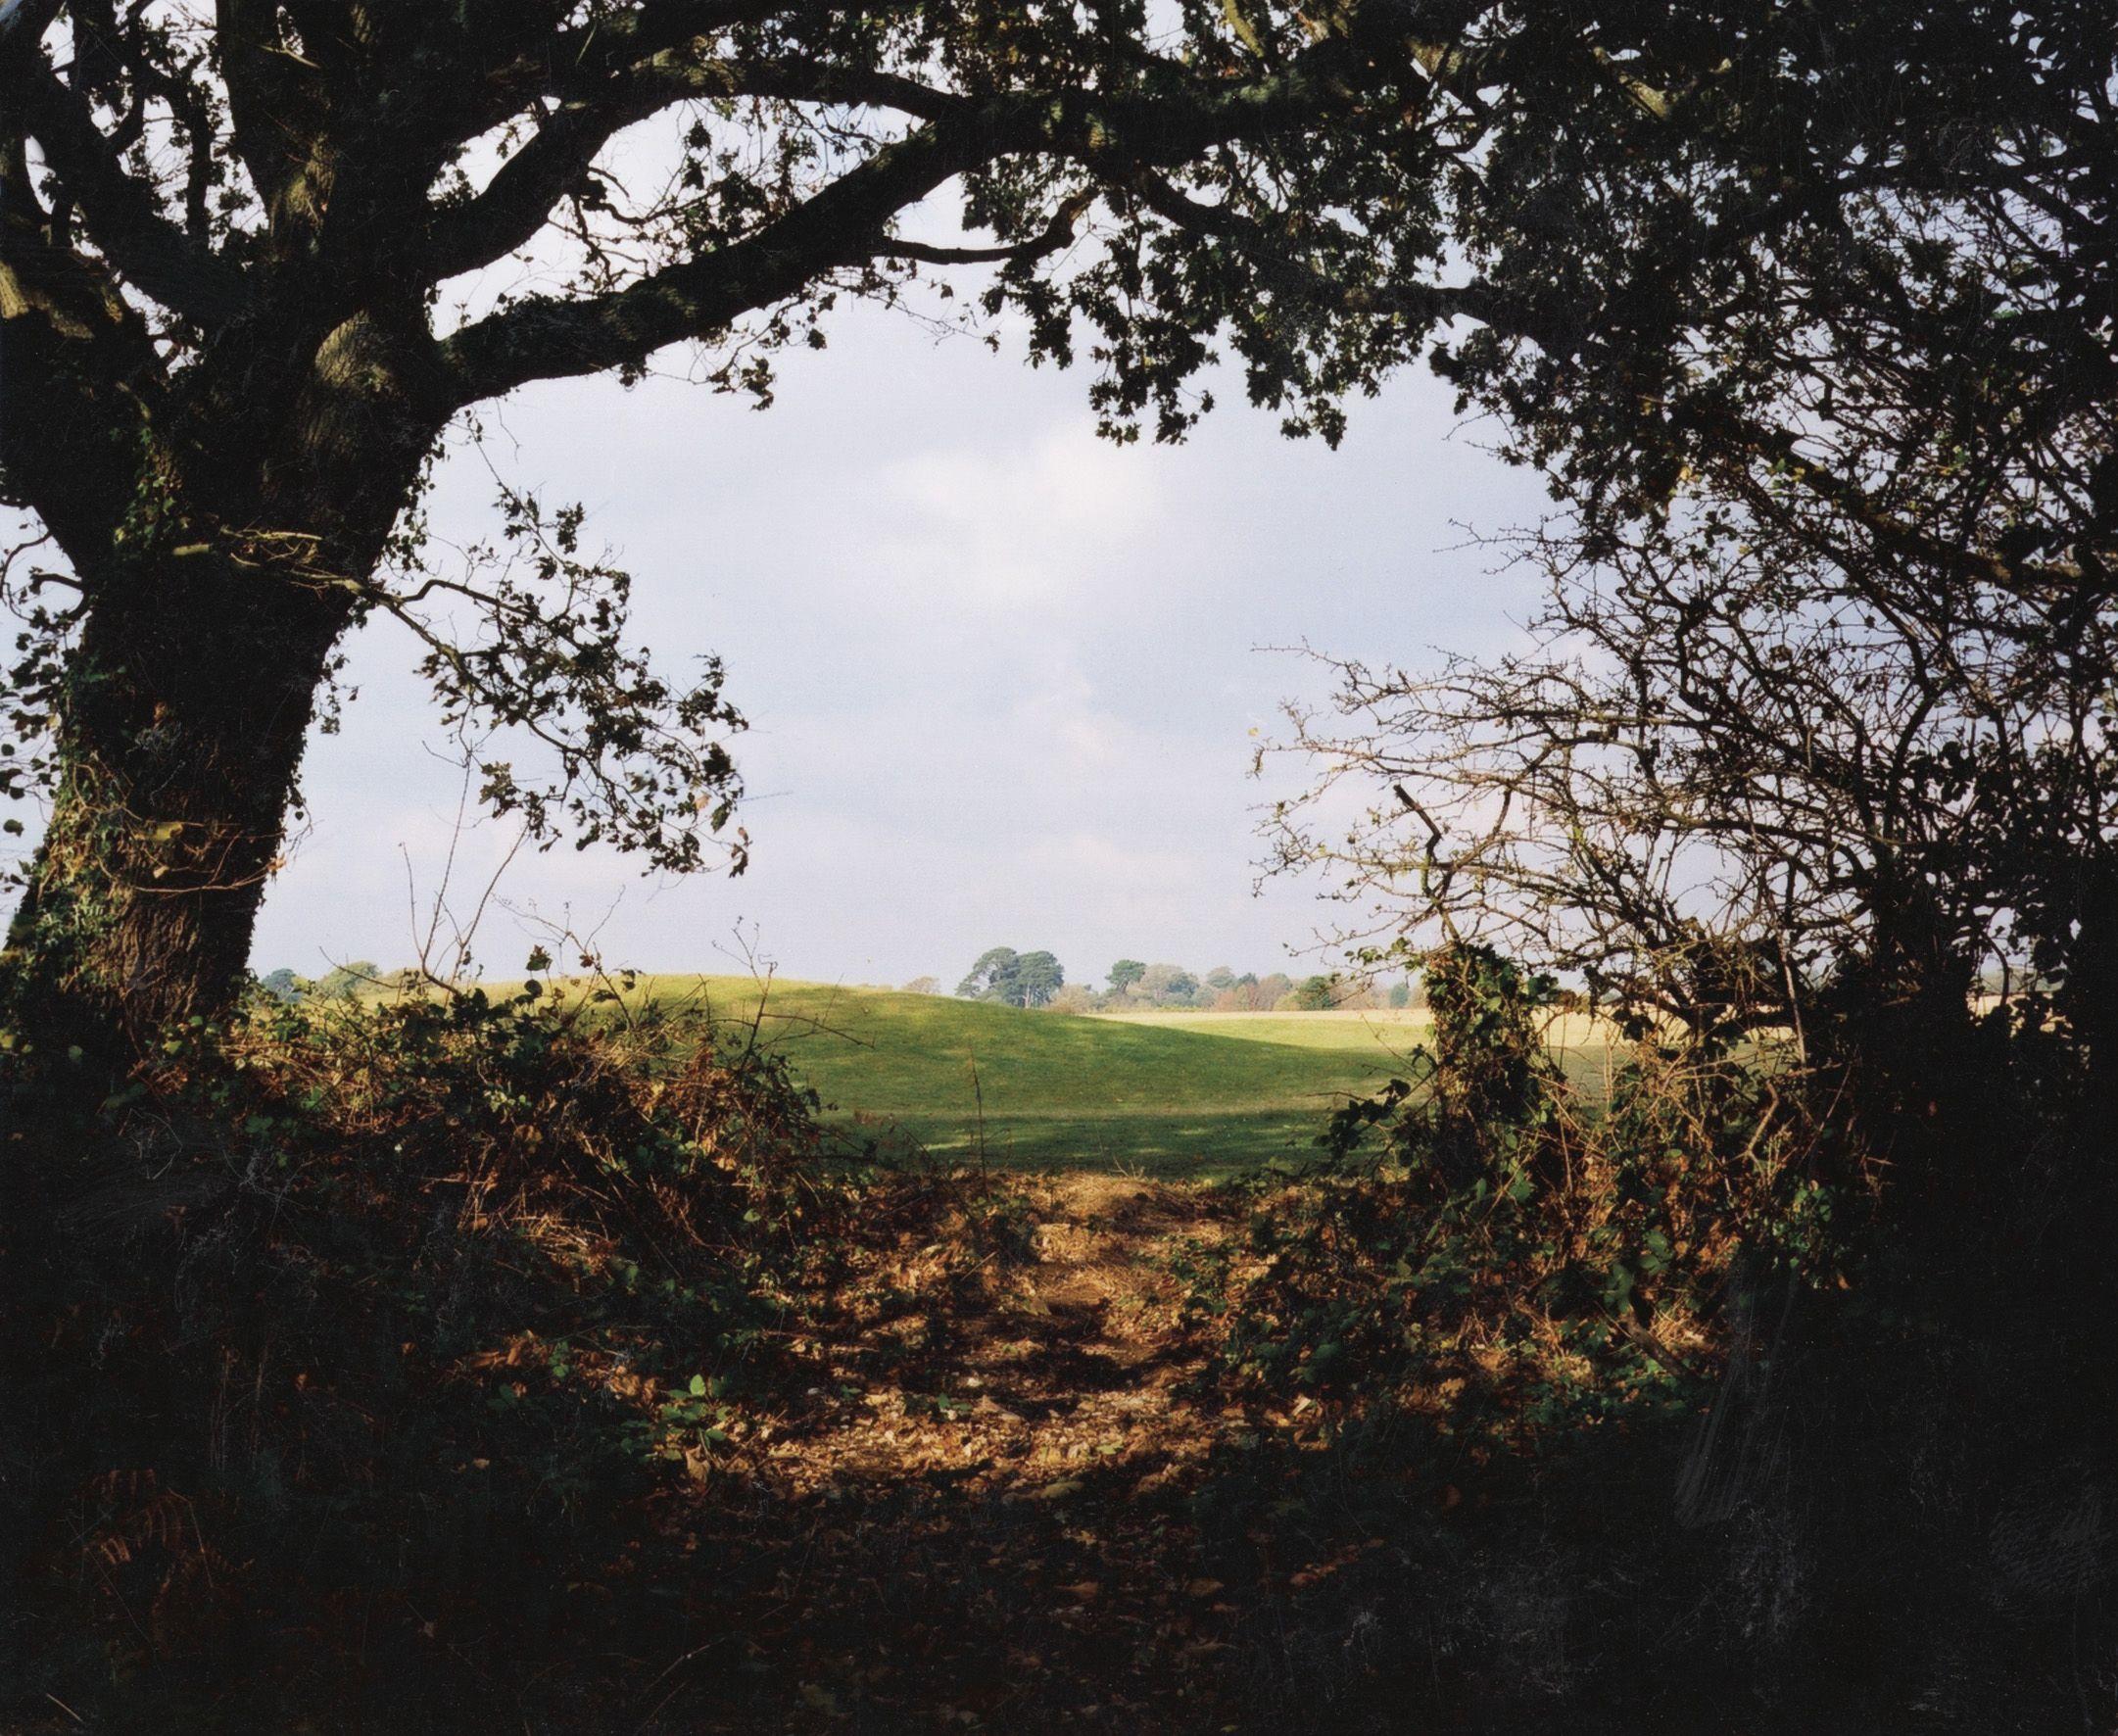 Seto New Forest 2003 Richard Billingham Landscape Photos Photography Landscape